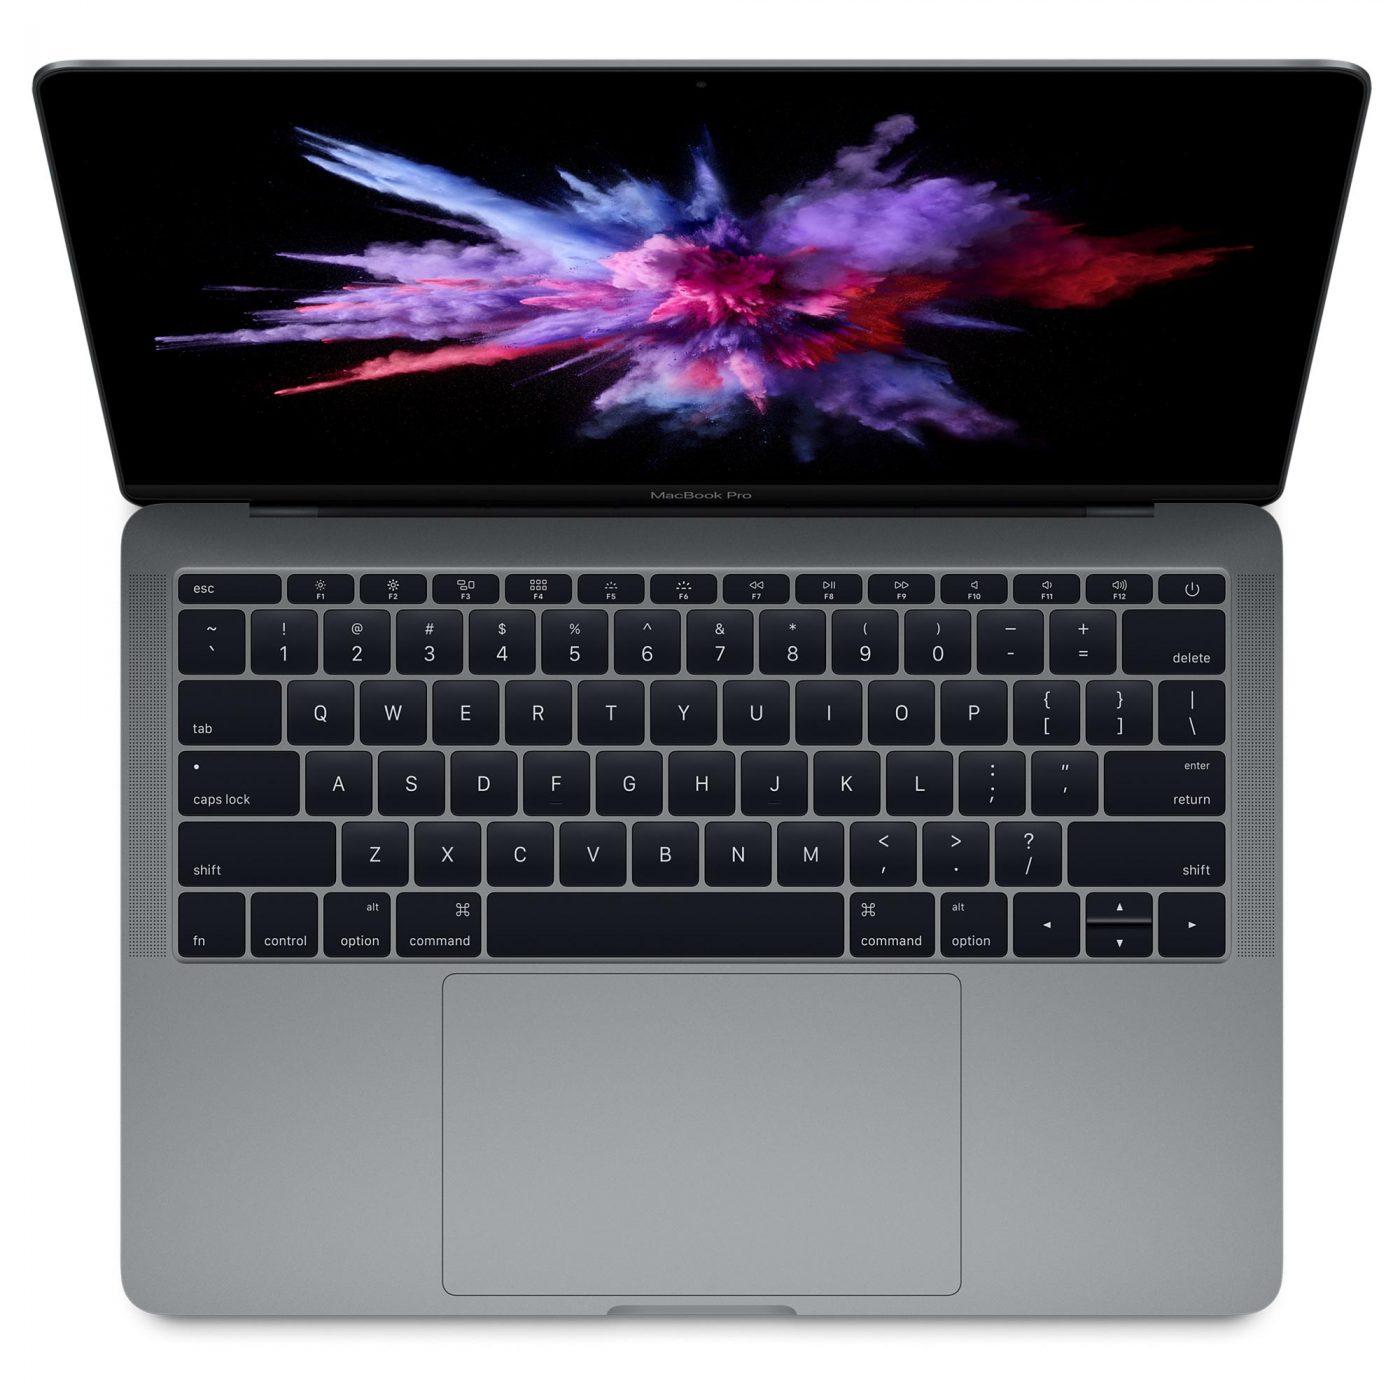 Refurbished MacBook Pro 13-inch Australia